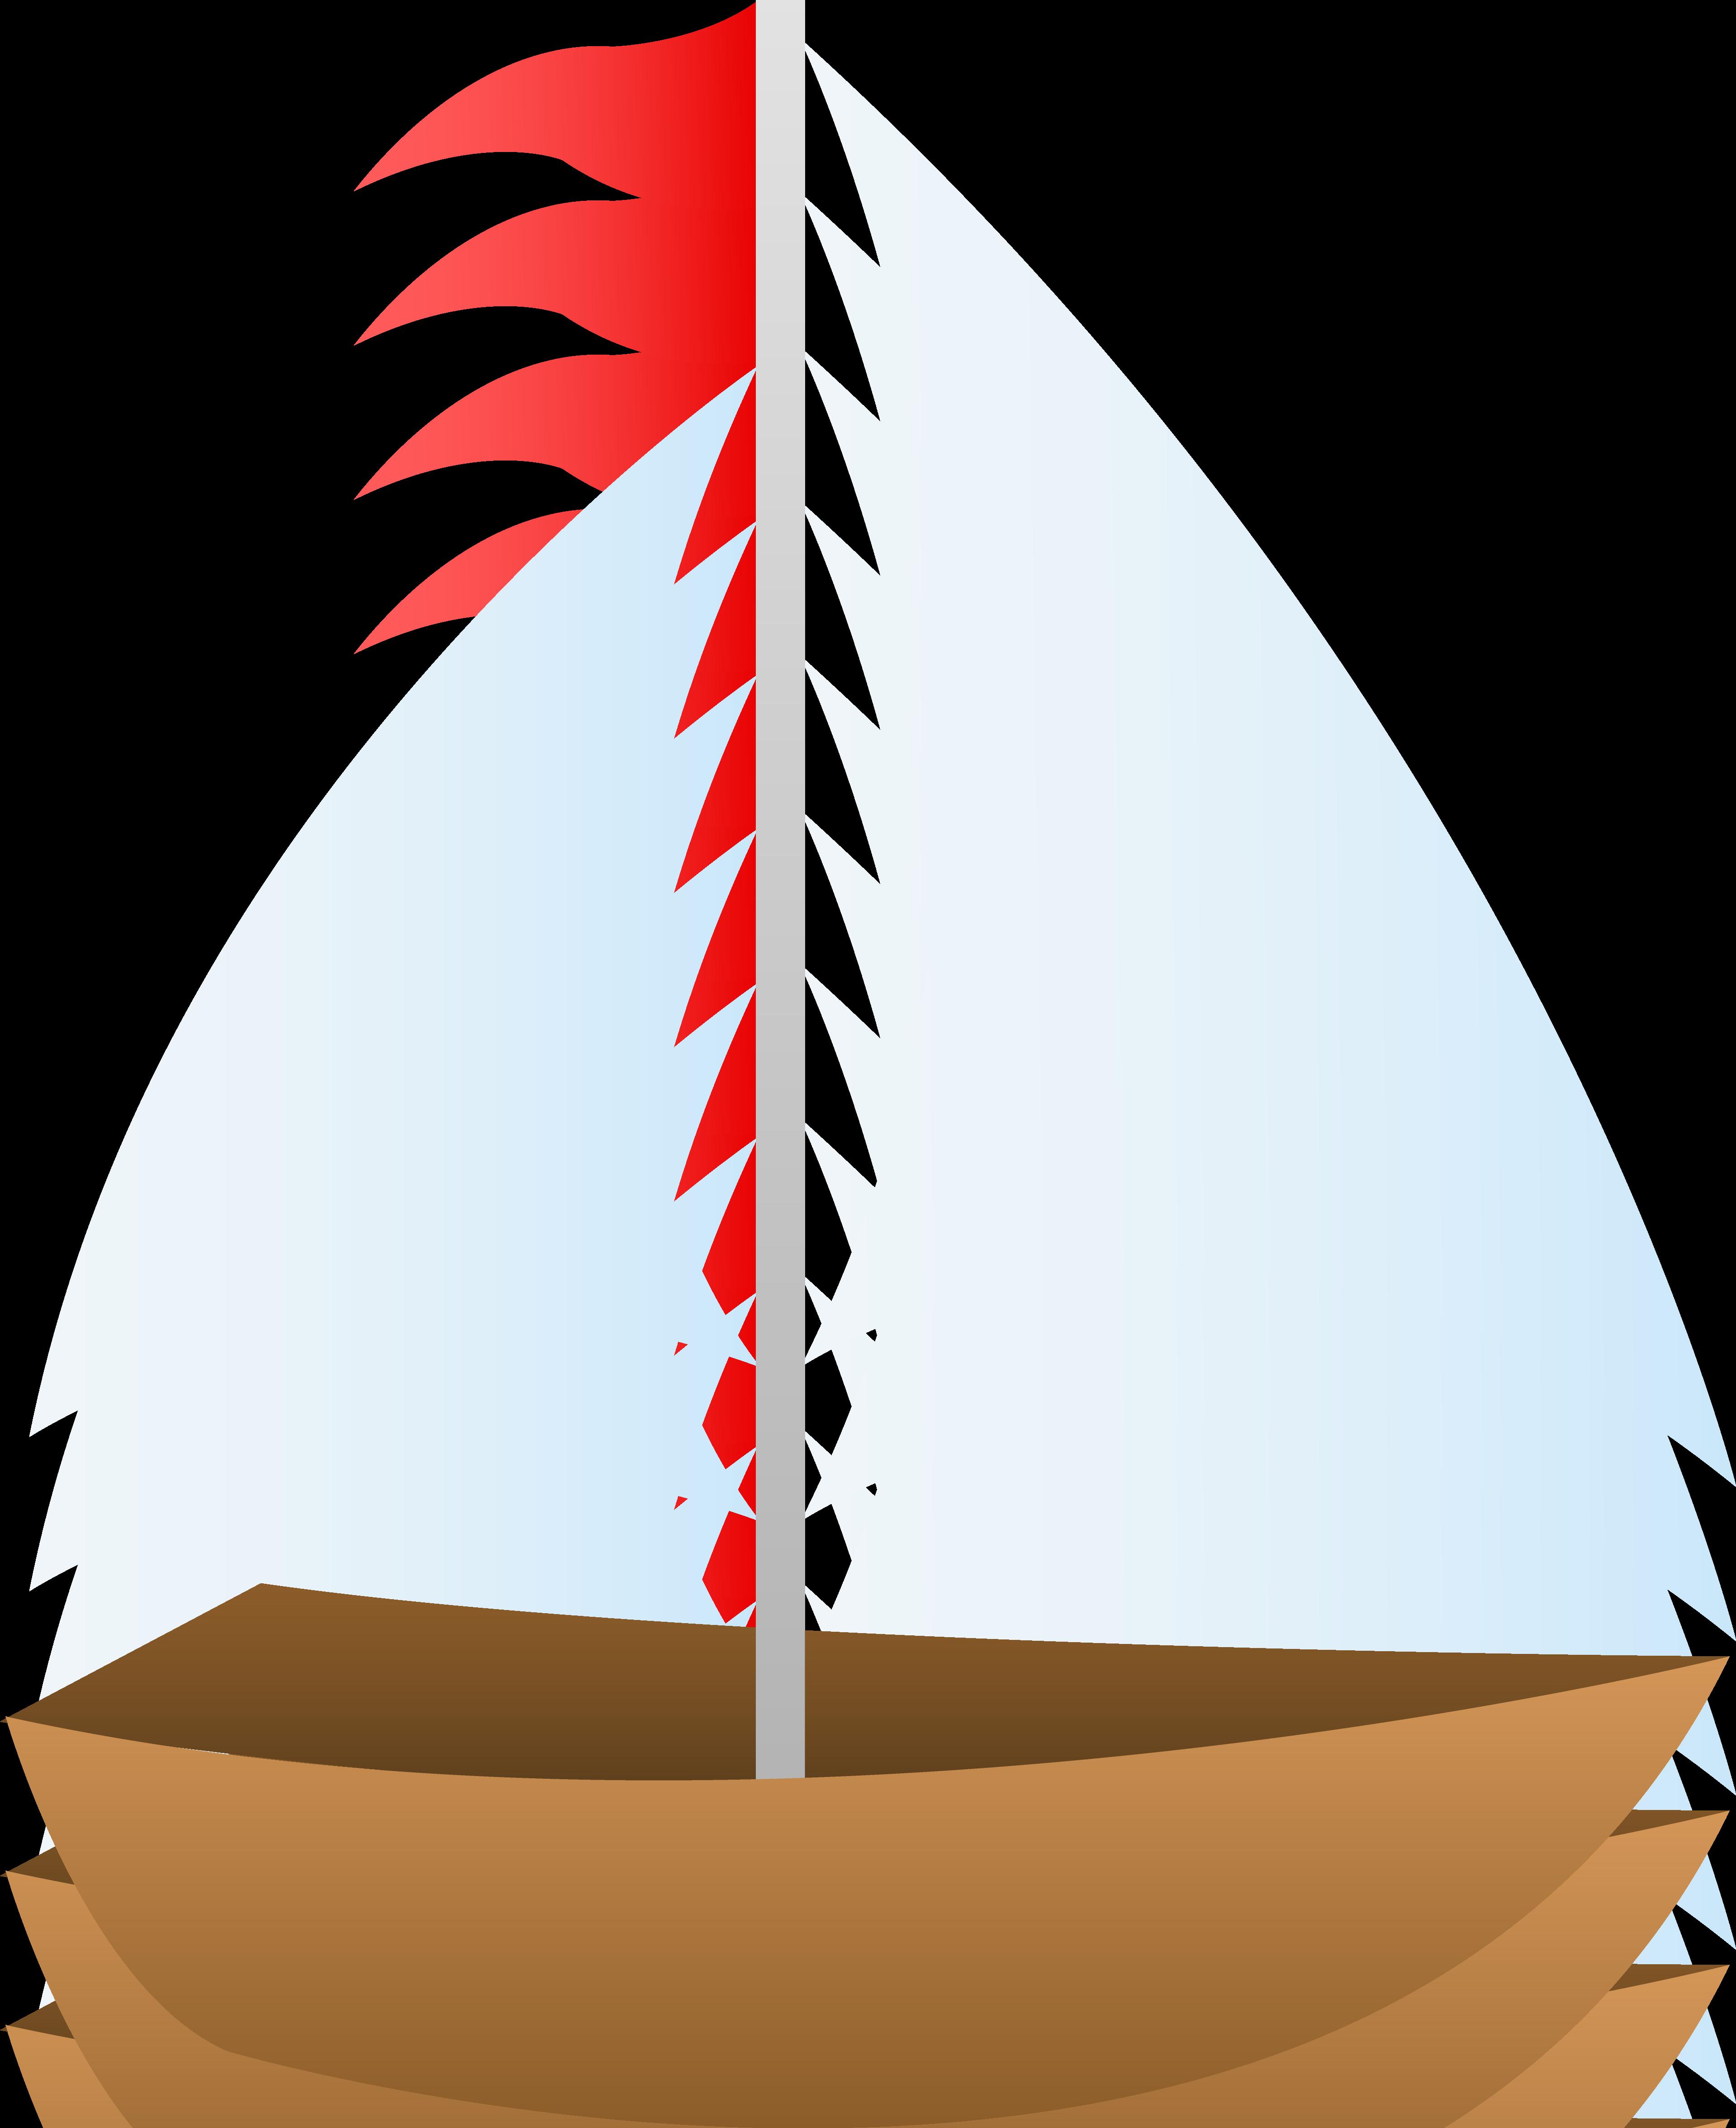 Image of Sailboat Clipart Boat .